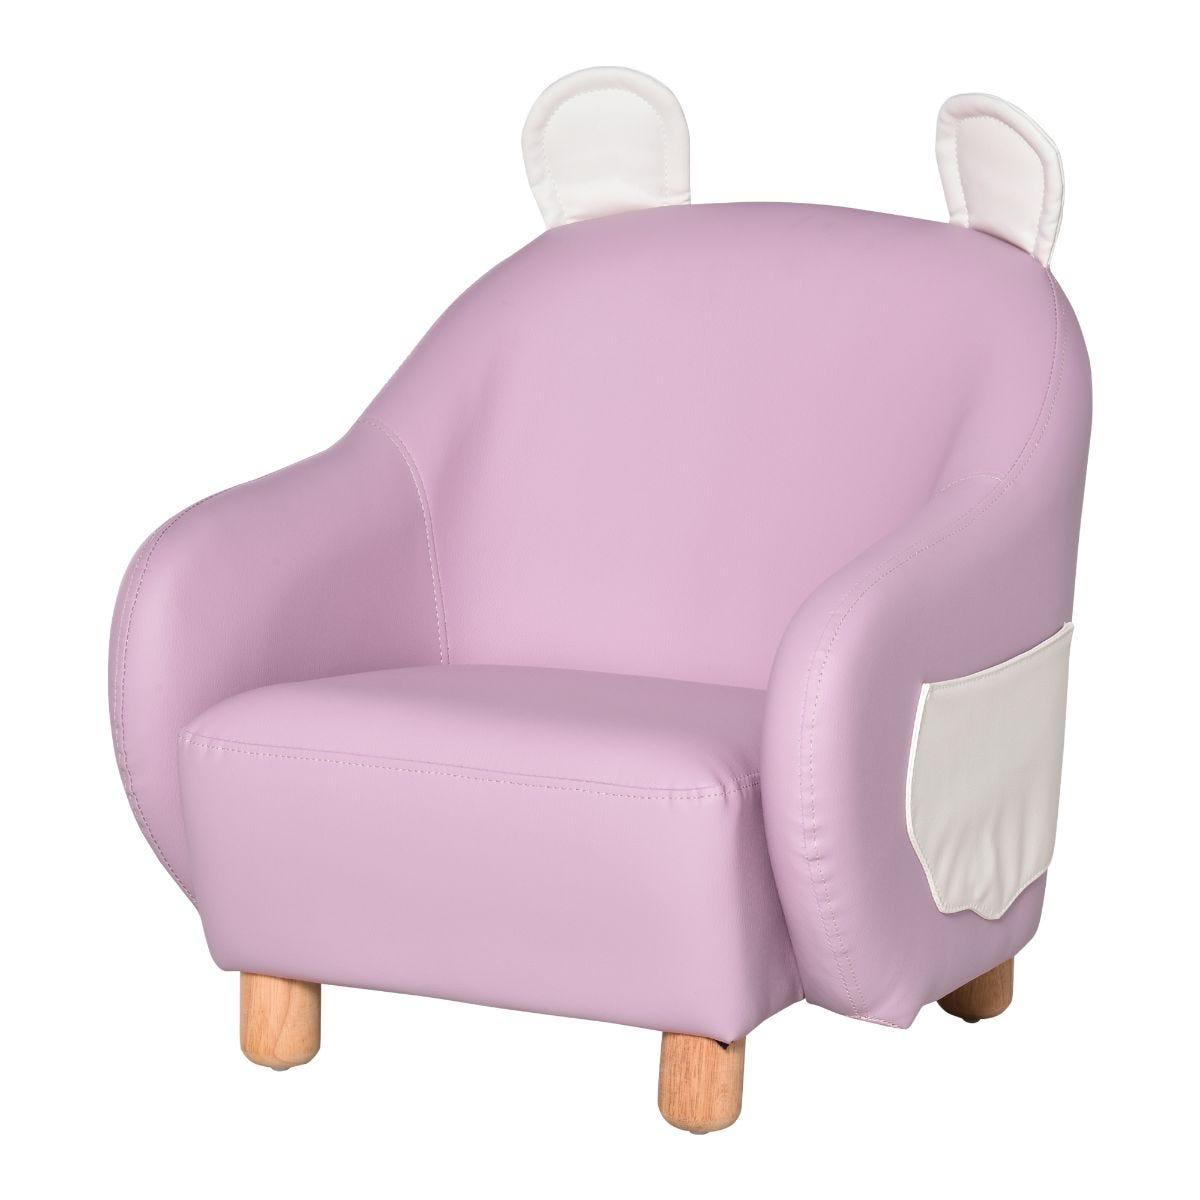 HOMCOM Cute Bunny Rabbit Kids Sofa Faux Leather Mini Armchair Pink